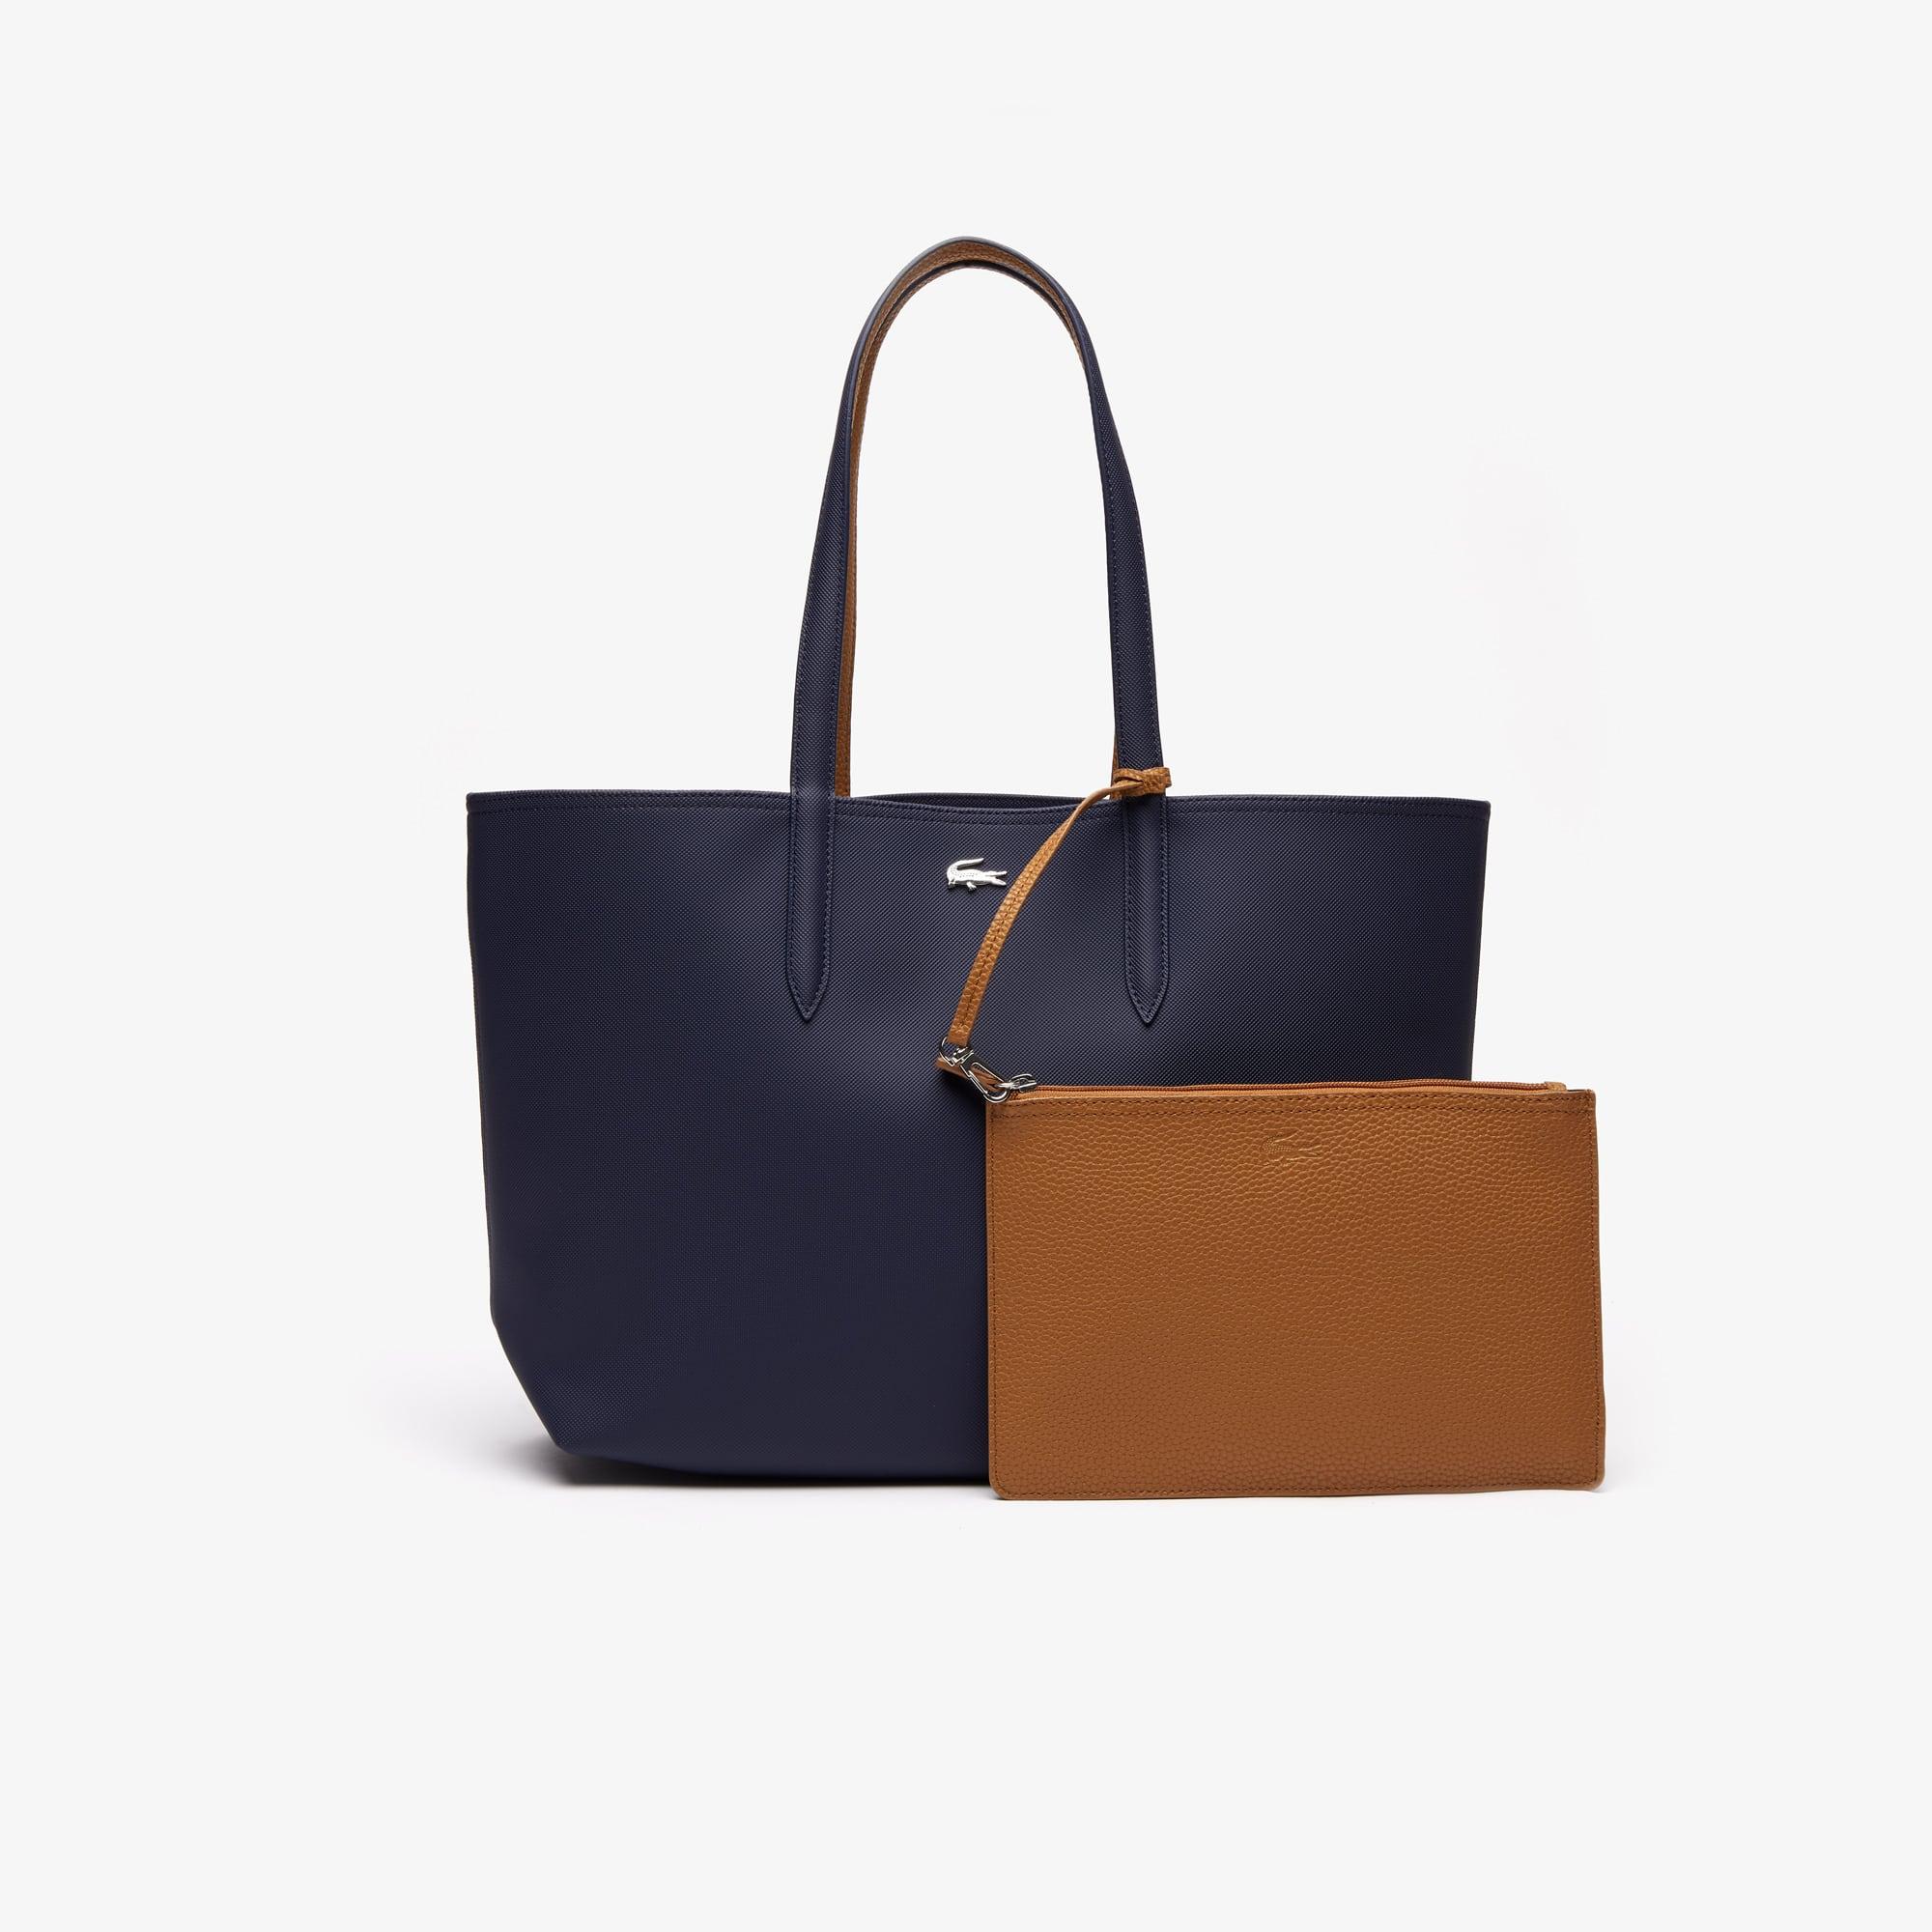 9e1d5aac1b1d Women s Anna Reversible Tote Bag